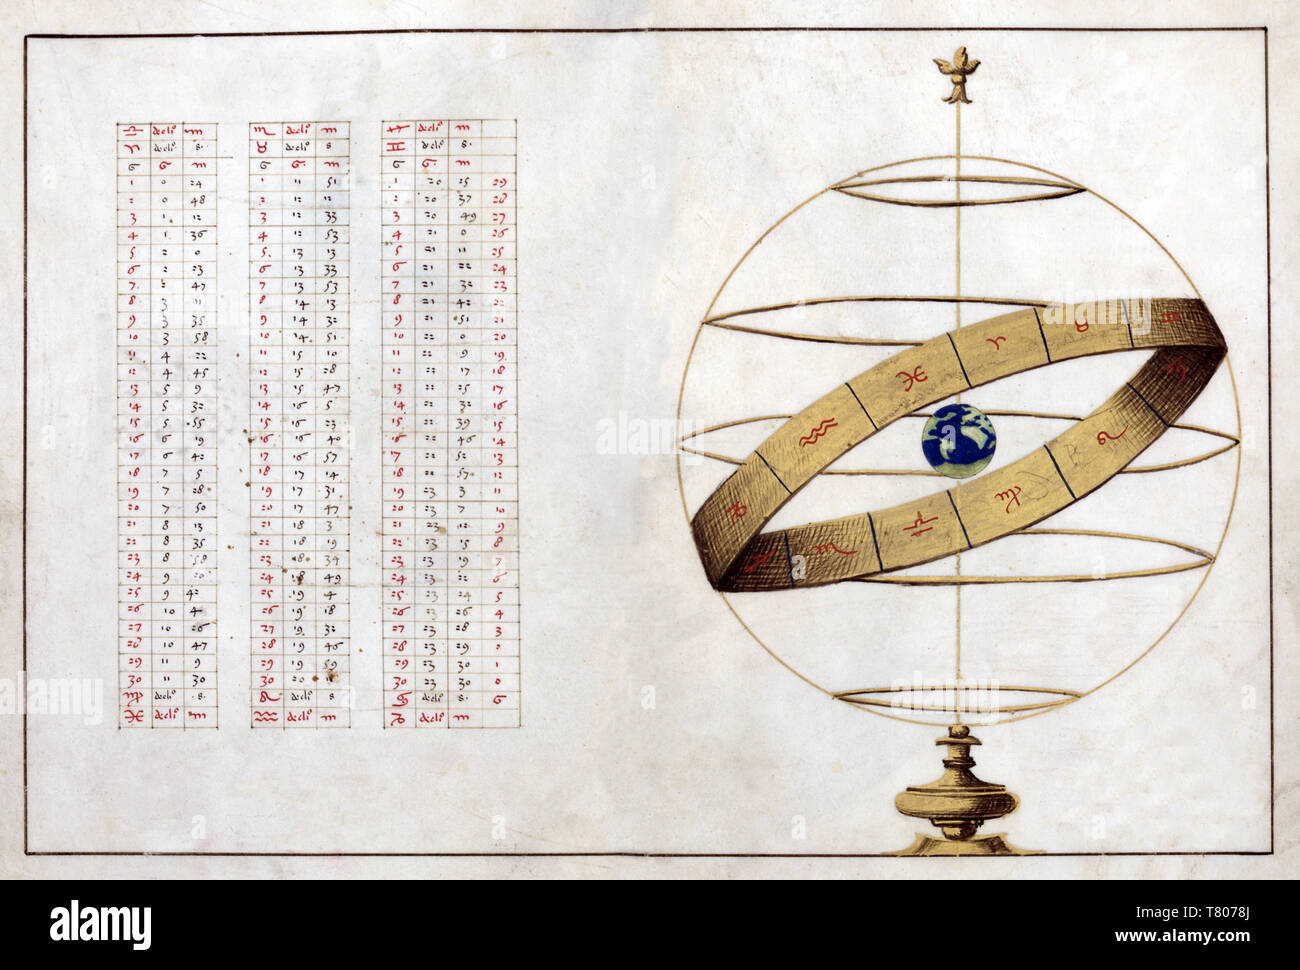 Battista Agnese, Portolan Atlas, Coordinates, 1544 - Stock Image